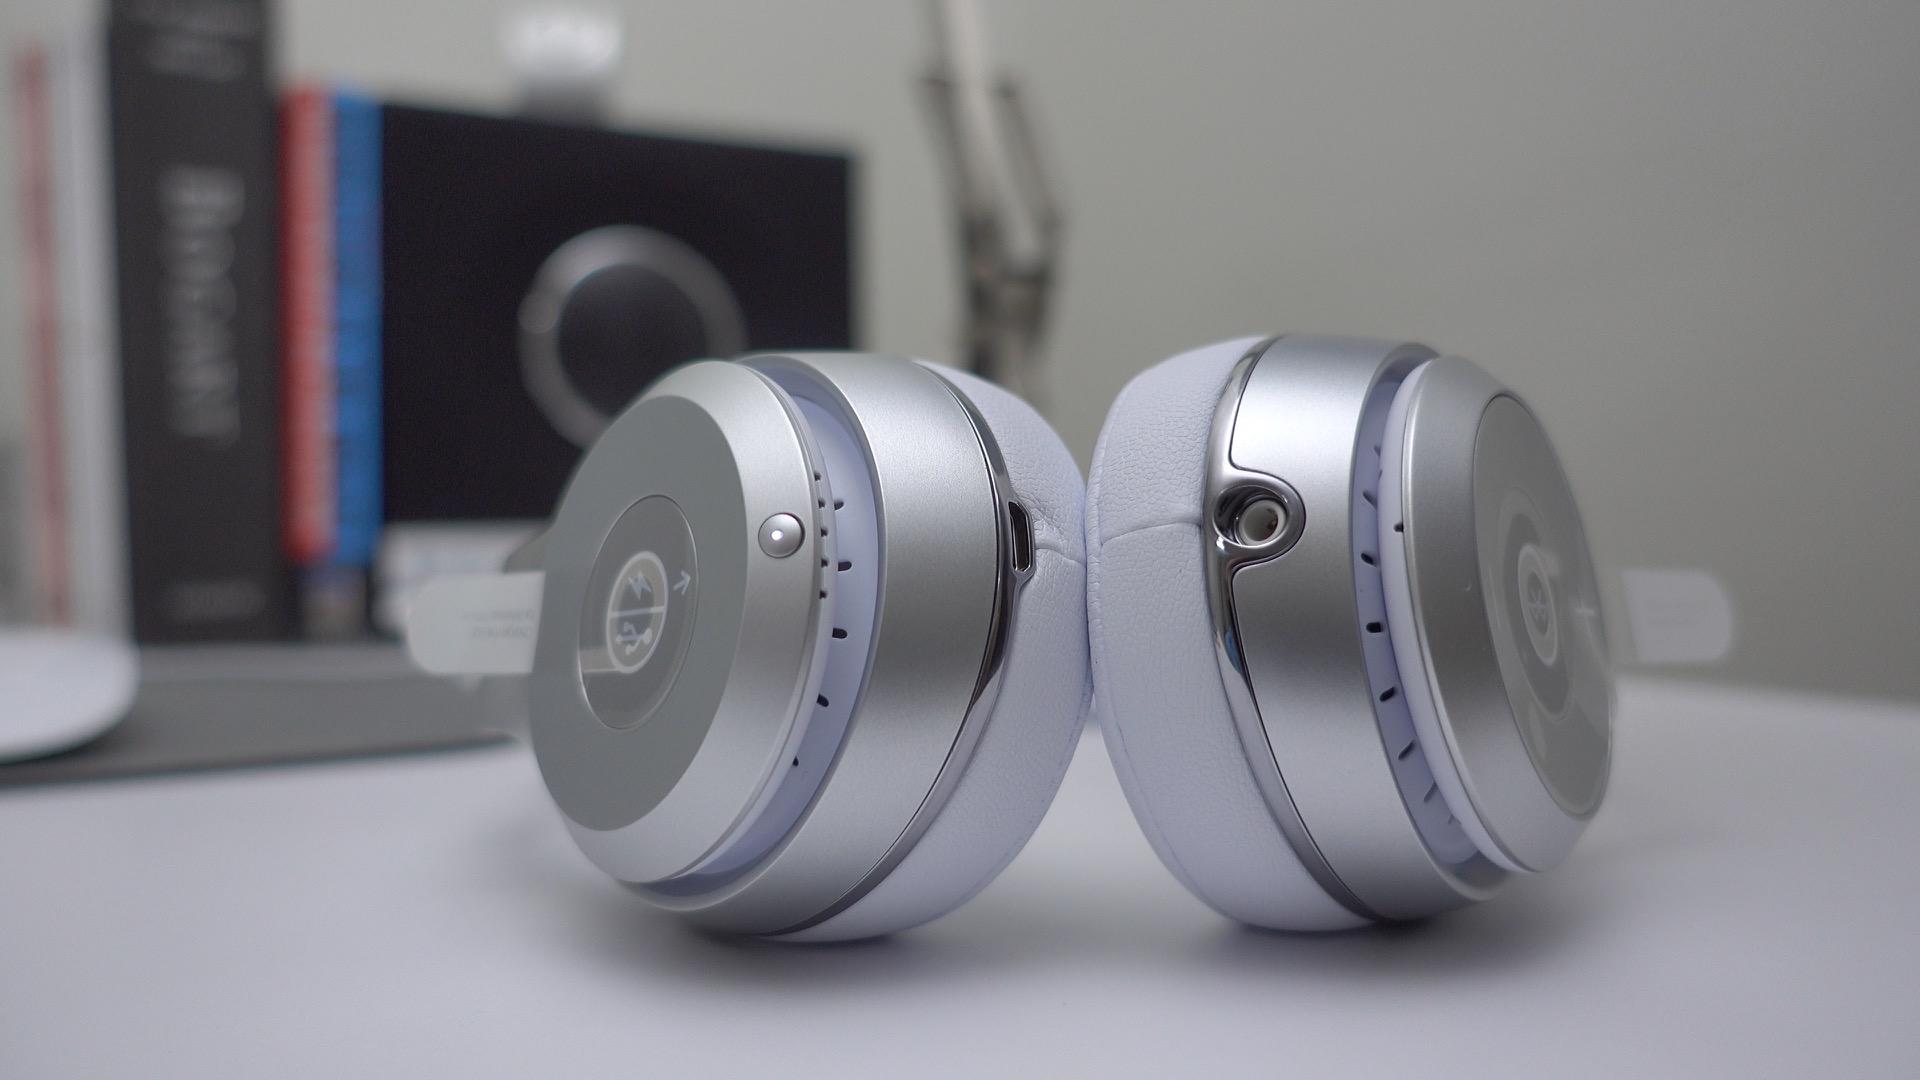 beats-solo-3-wireless-headphones-w1-chip